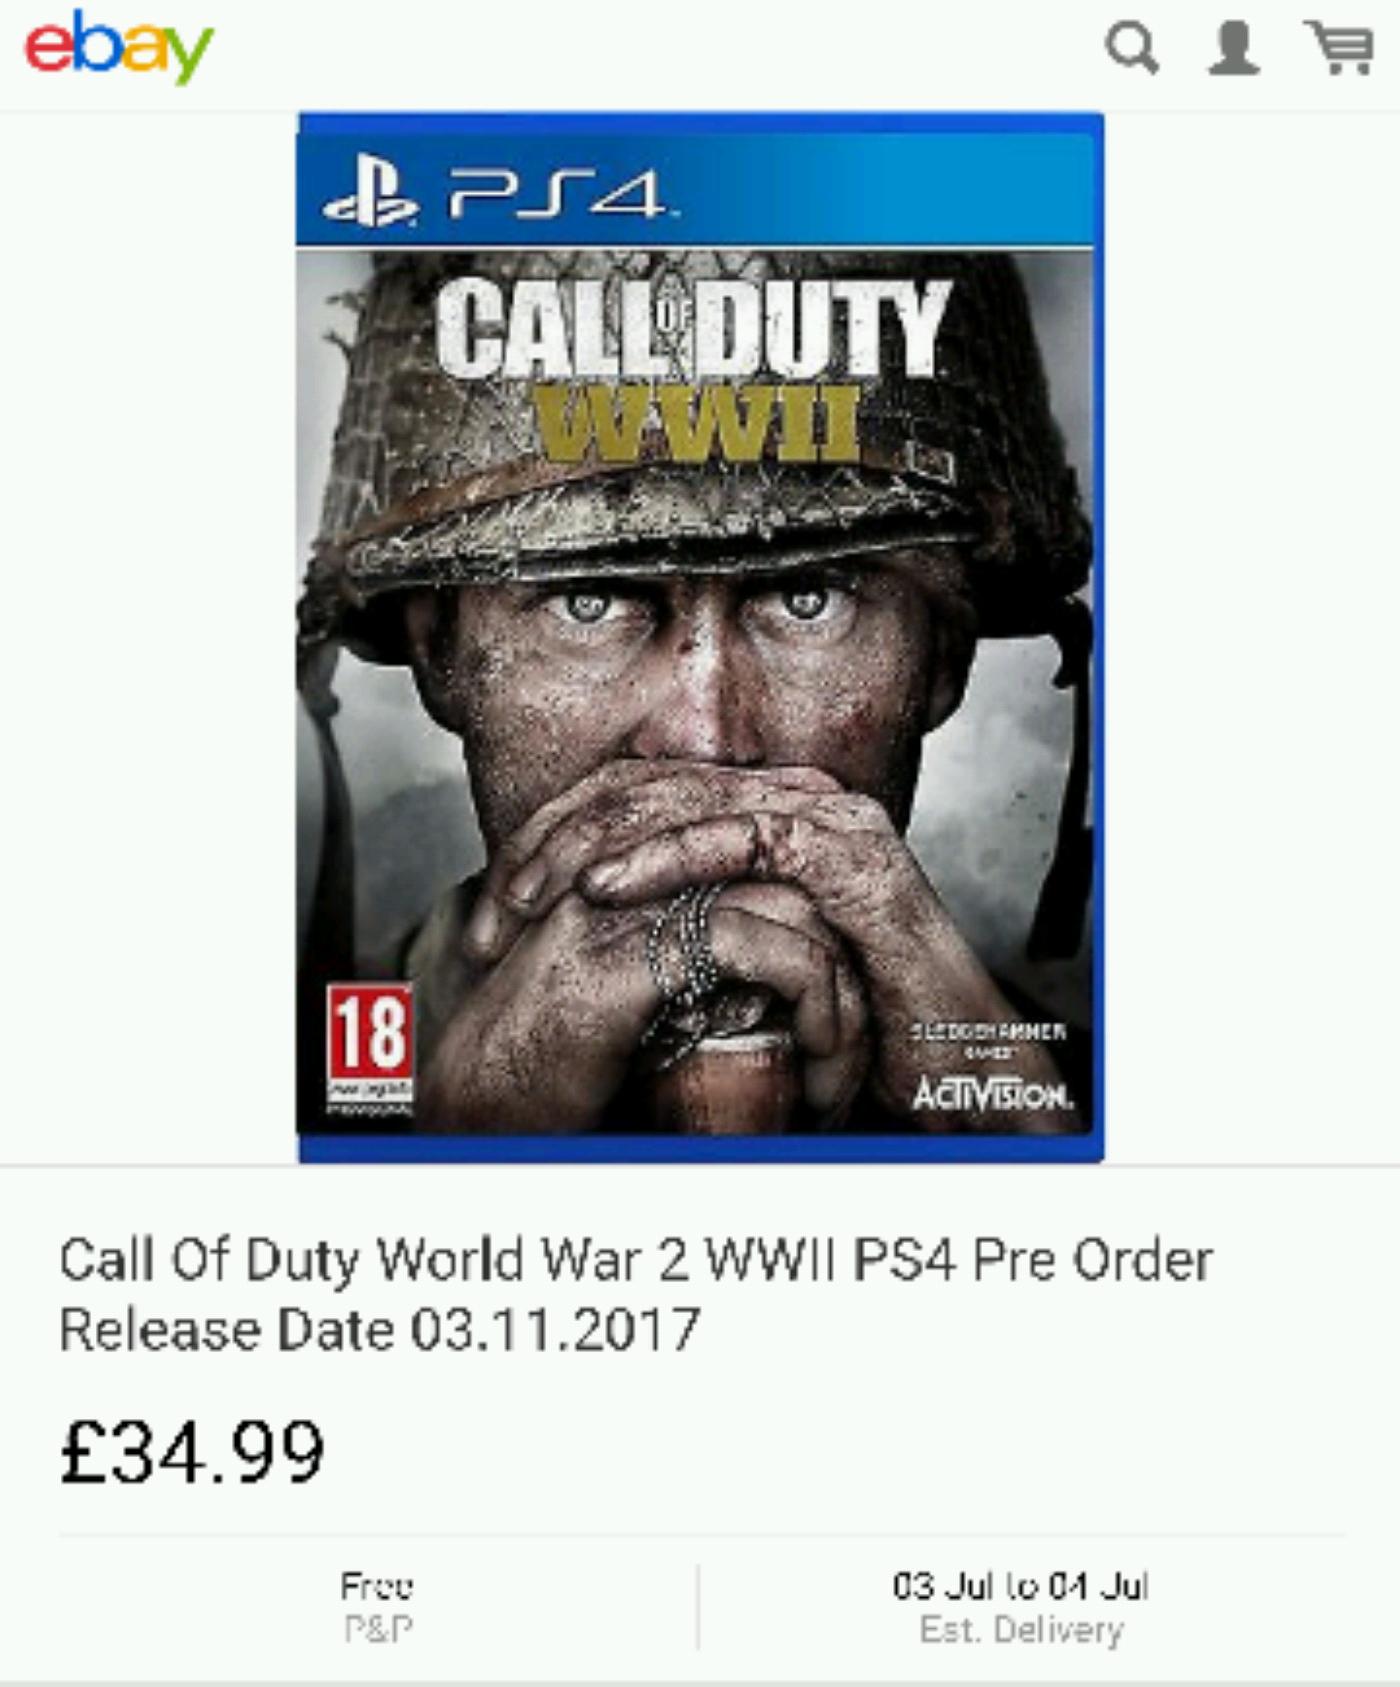 Call Of Duty WW2 PS4 Pre Order seller: skyline-media £34.99 @ ebay